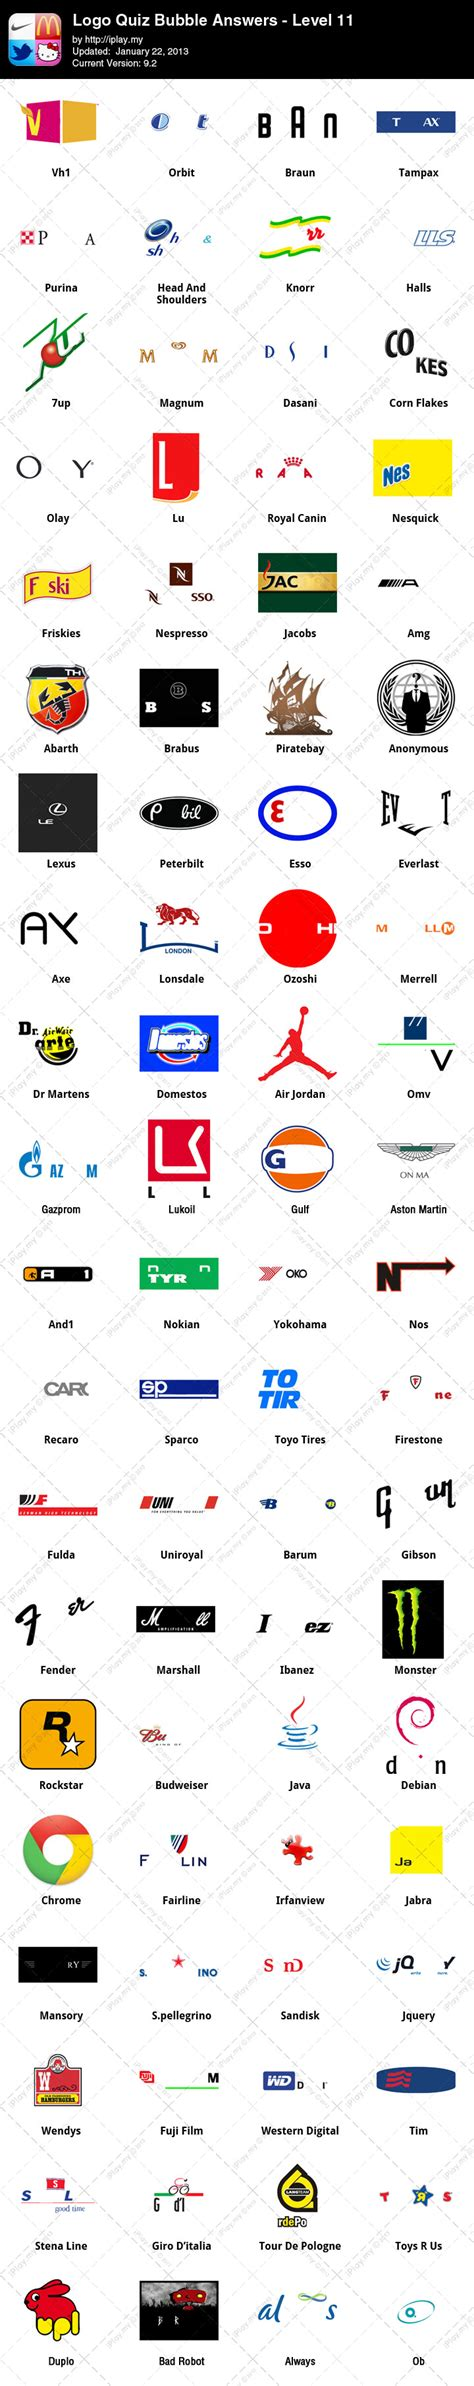 logo quiz answers level 11 logos quiz gouci app level 11 game solver logo quiz androidcrowd